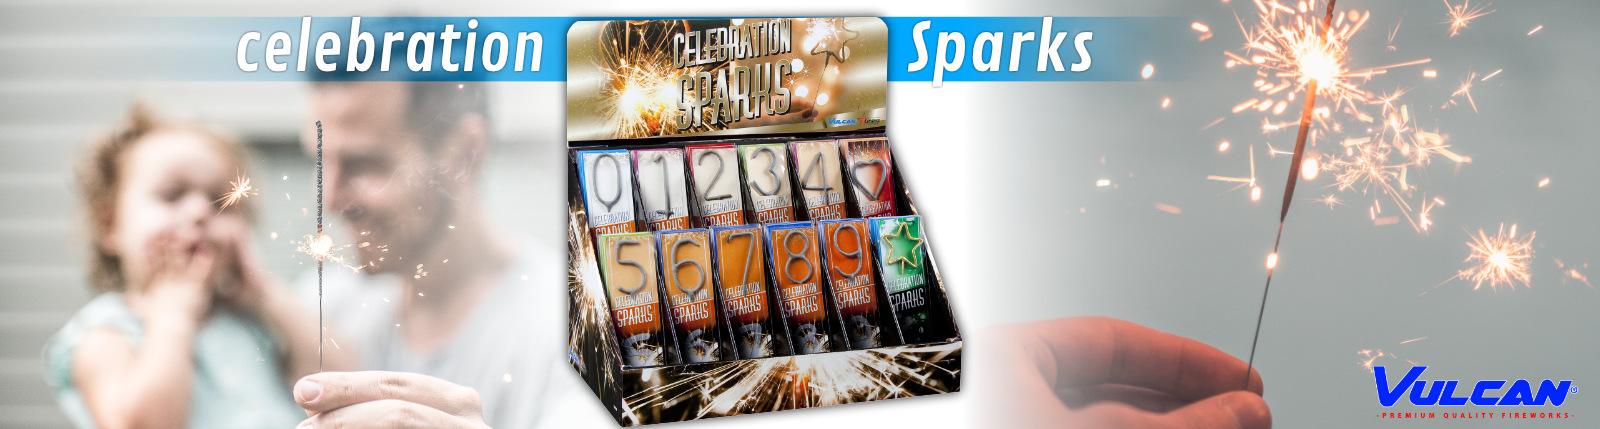 Celebration sparks